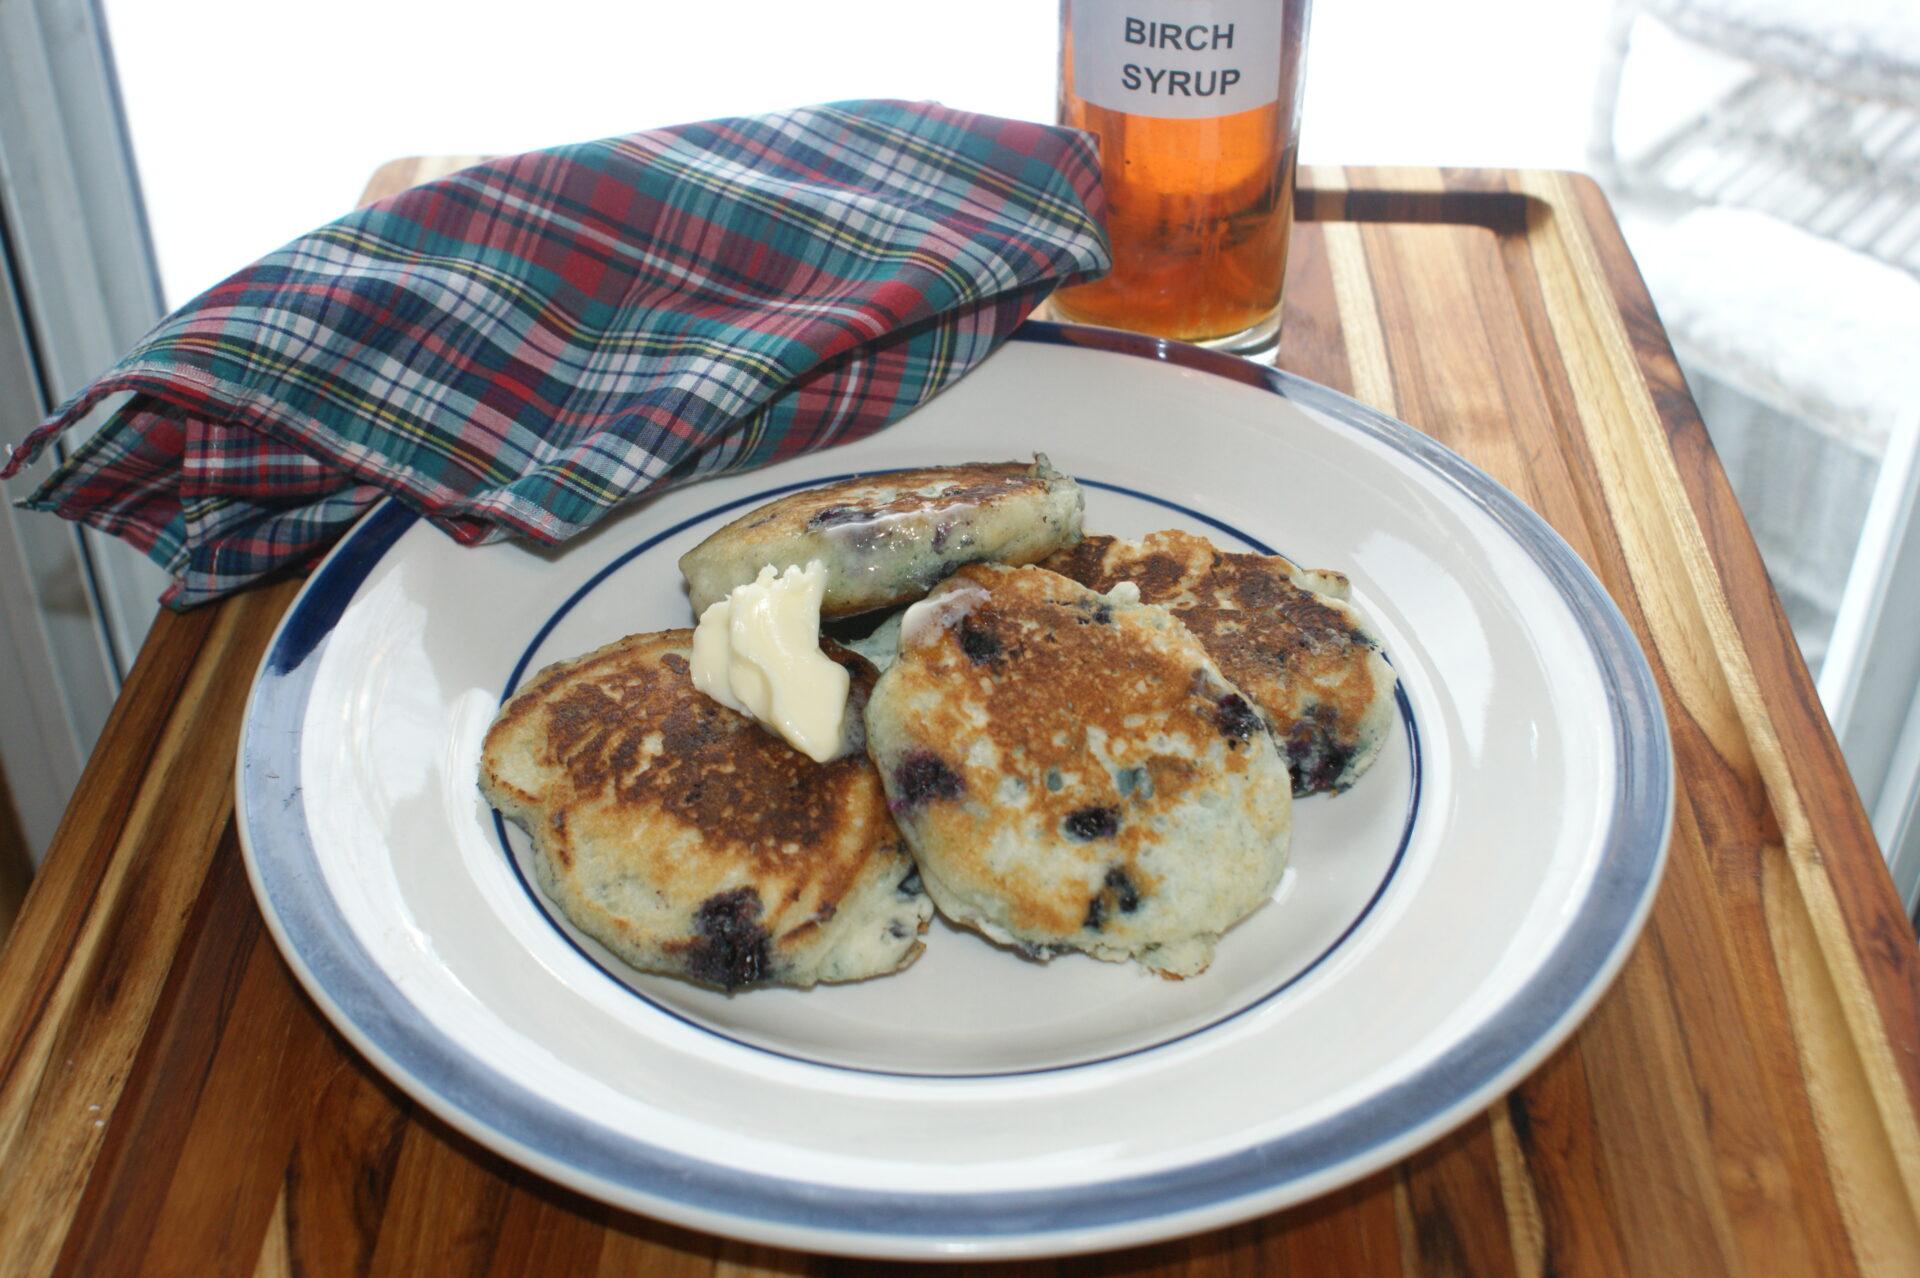 Wild Blueberry-Buttermilk Pancakes With Birch Syrup